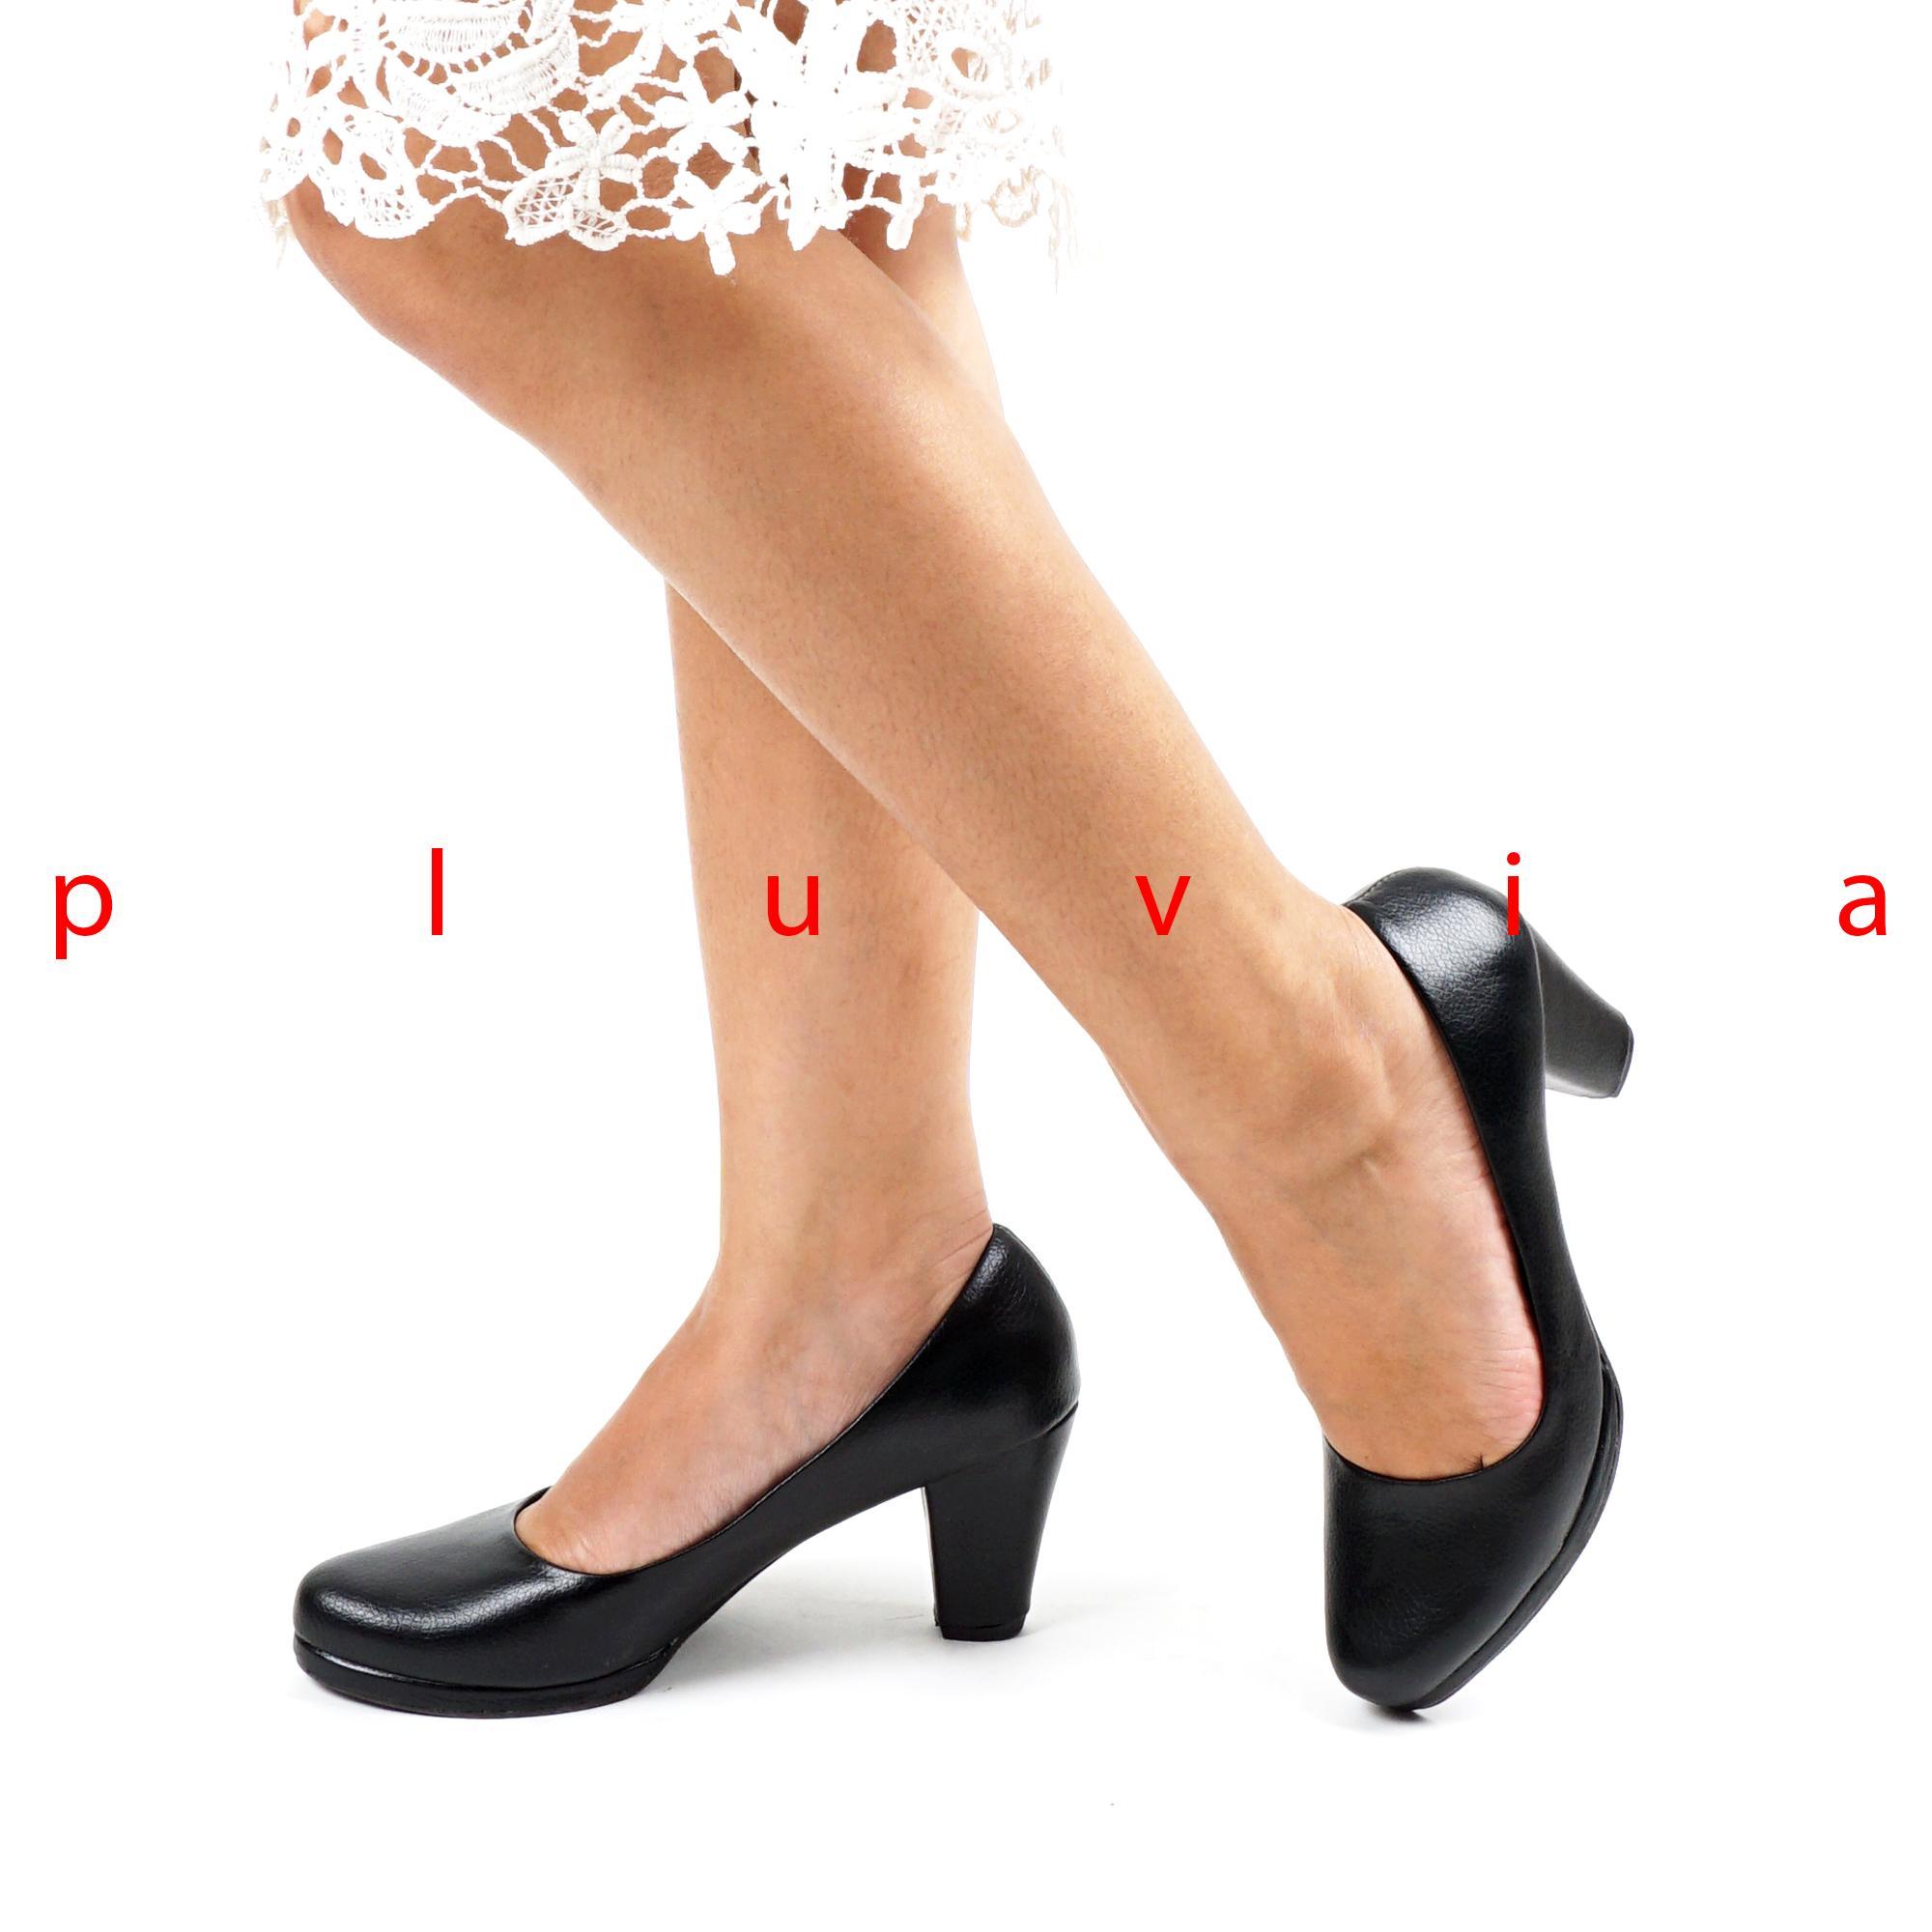 Pluvia - Sepatu Kerja Pantofel High Heels Wanita SD01 - Hitam